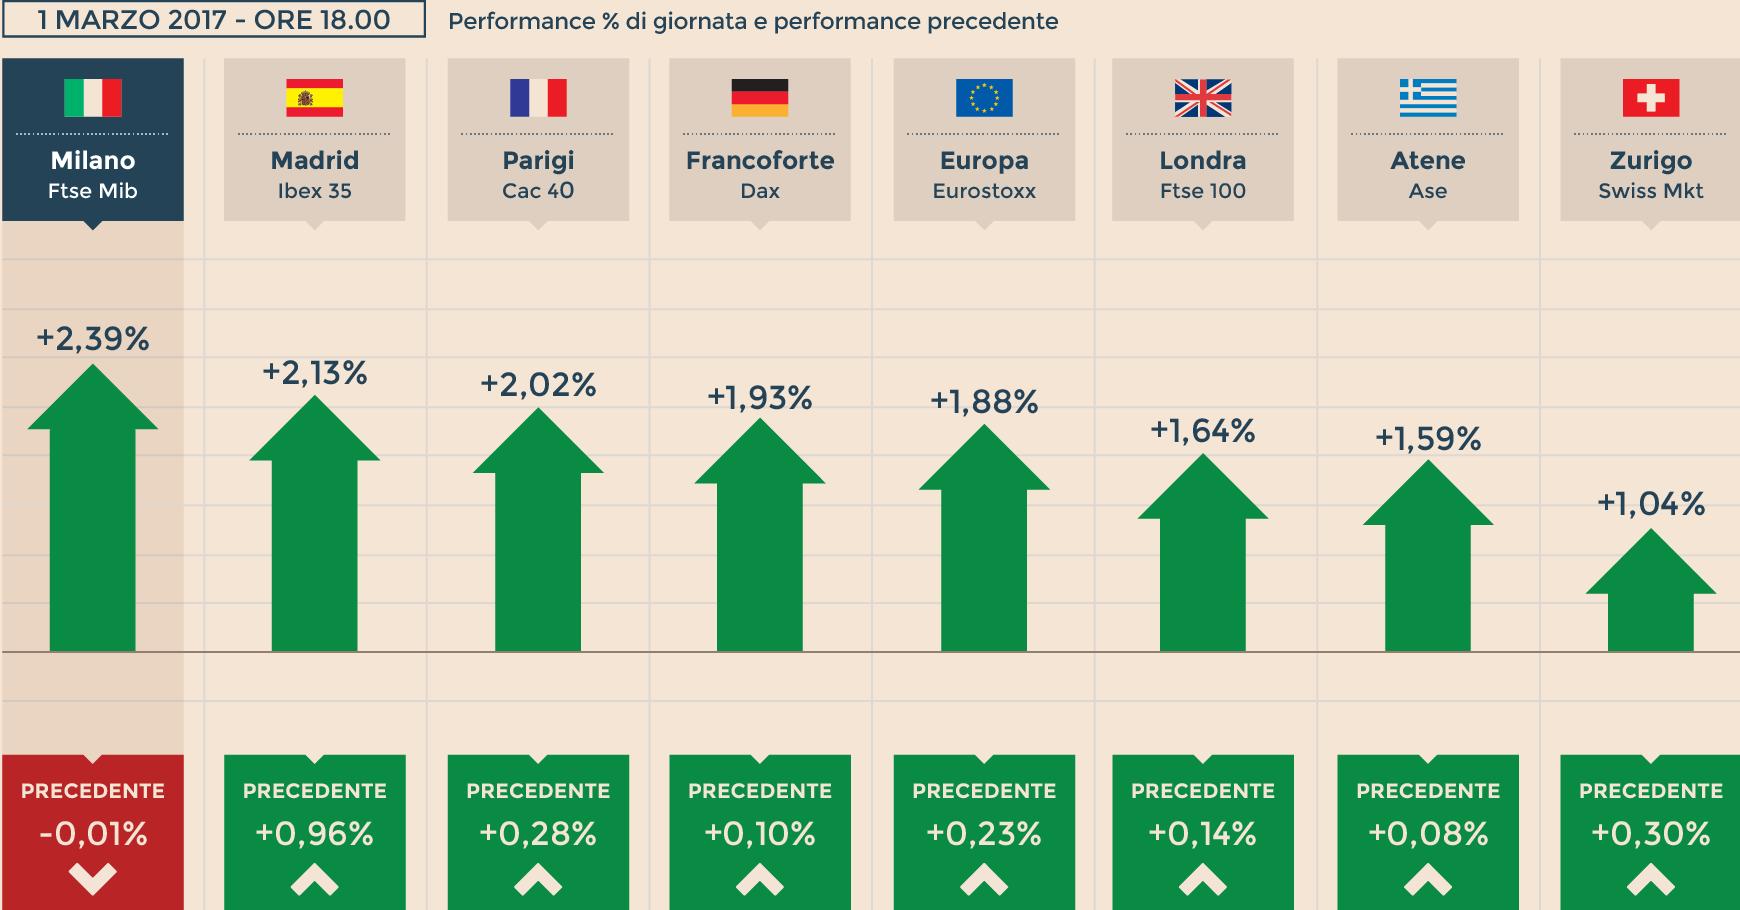 e6dc7fa234 Borse, Wall Street a 21mila punti. L'Europa corre, Milano (+2,39 ...